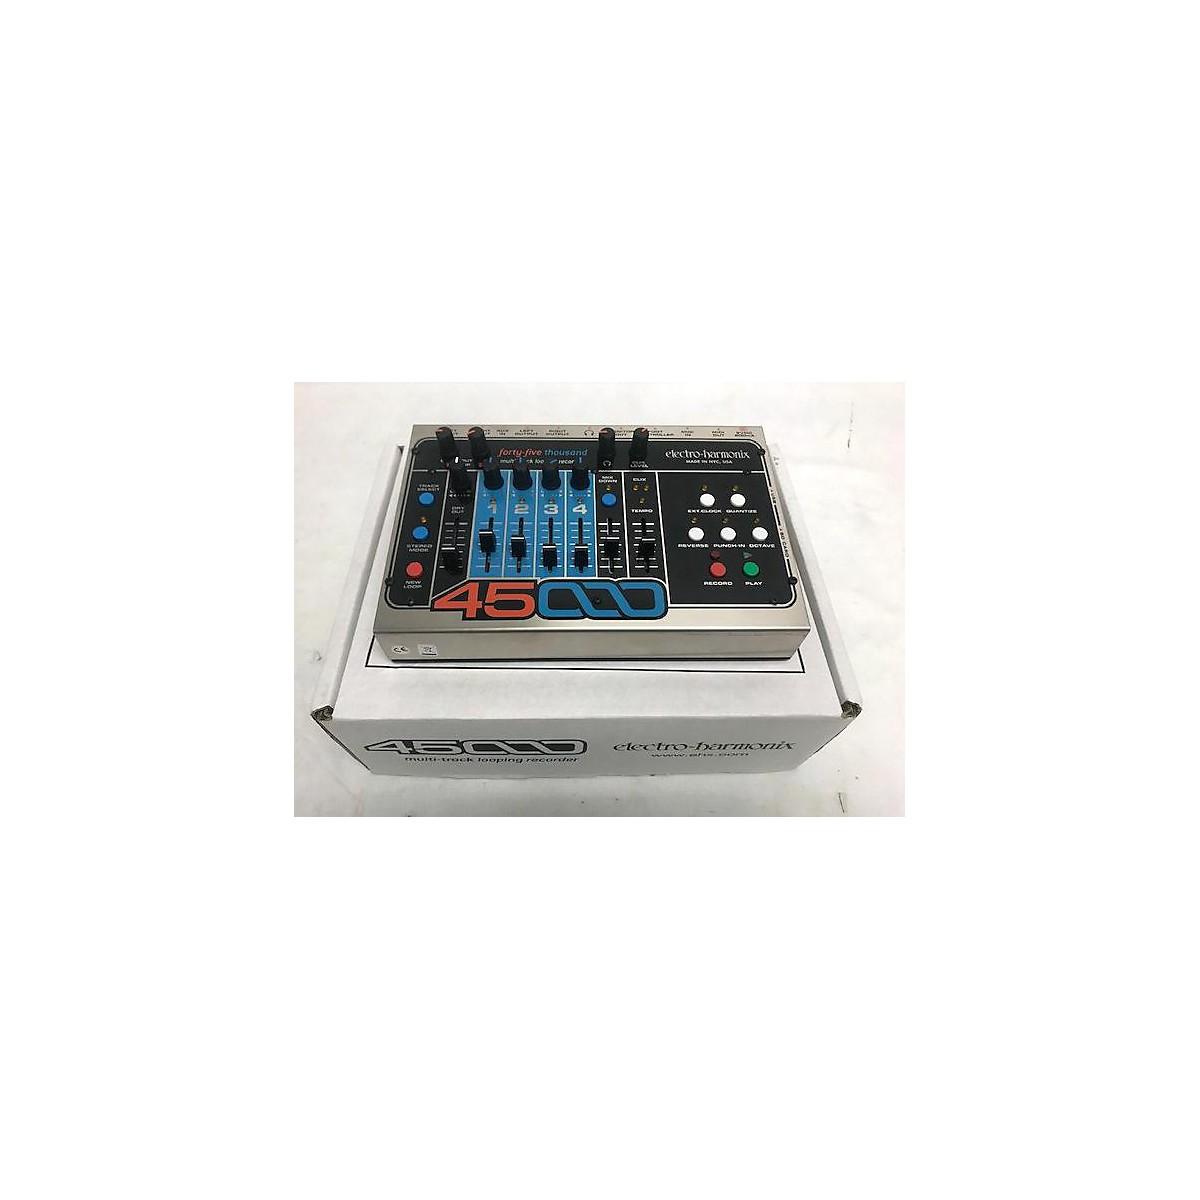 Electro-Harmonix 45000 Multi-track Looping Recorder Pedal